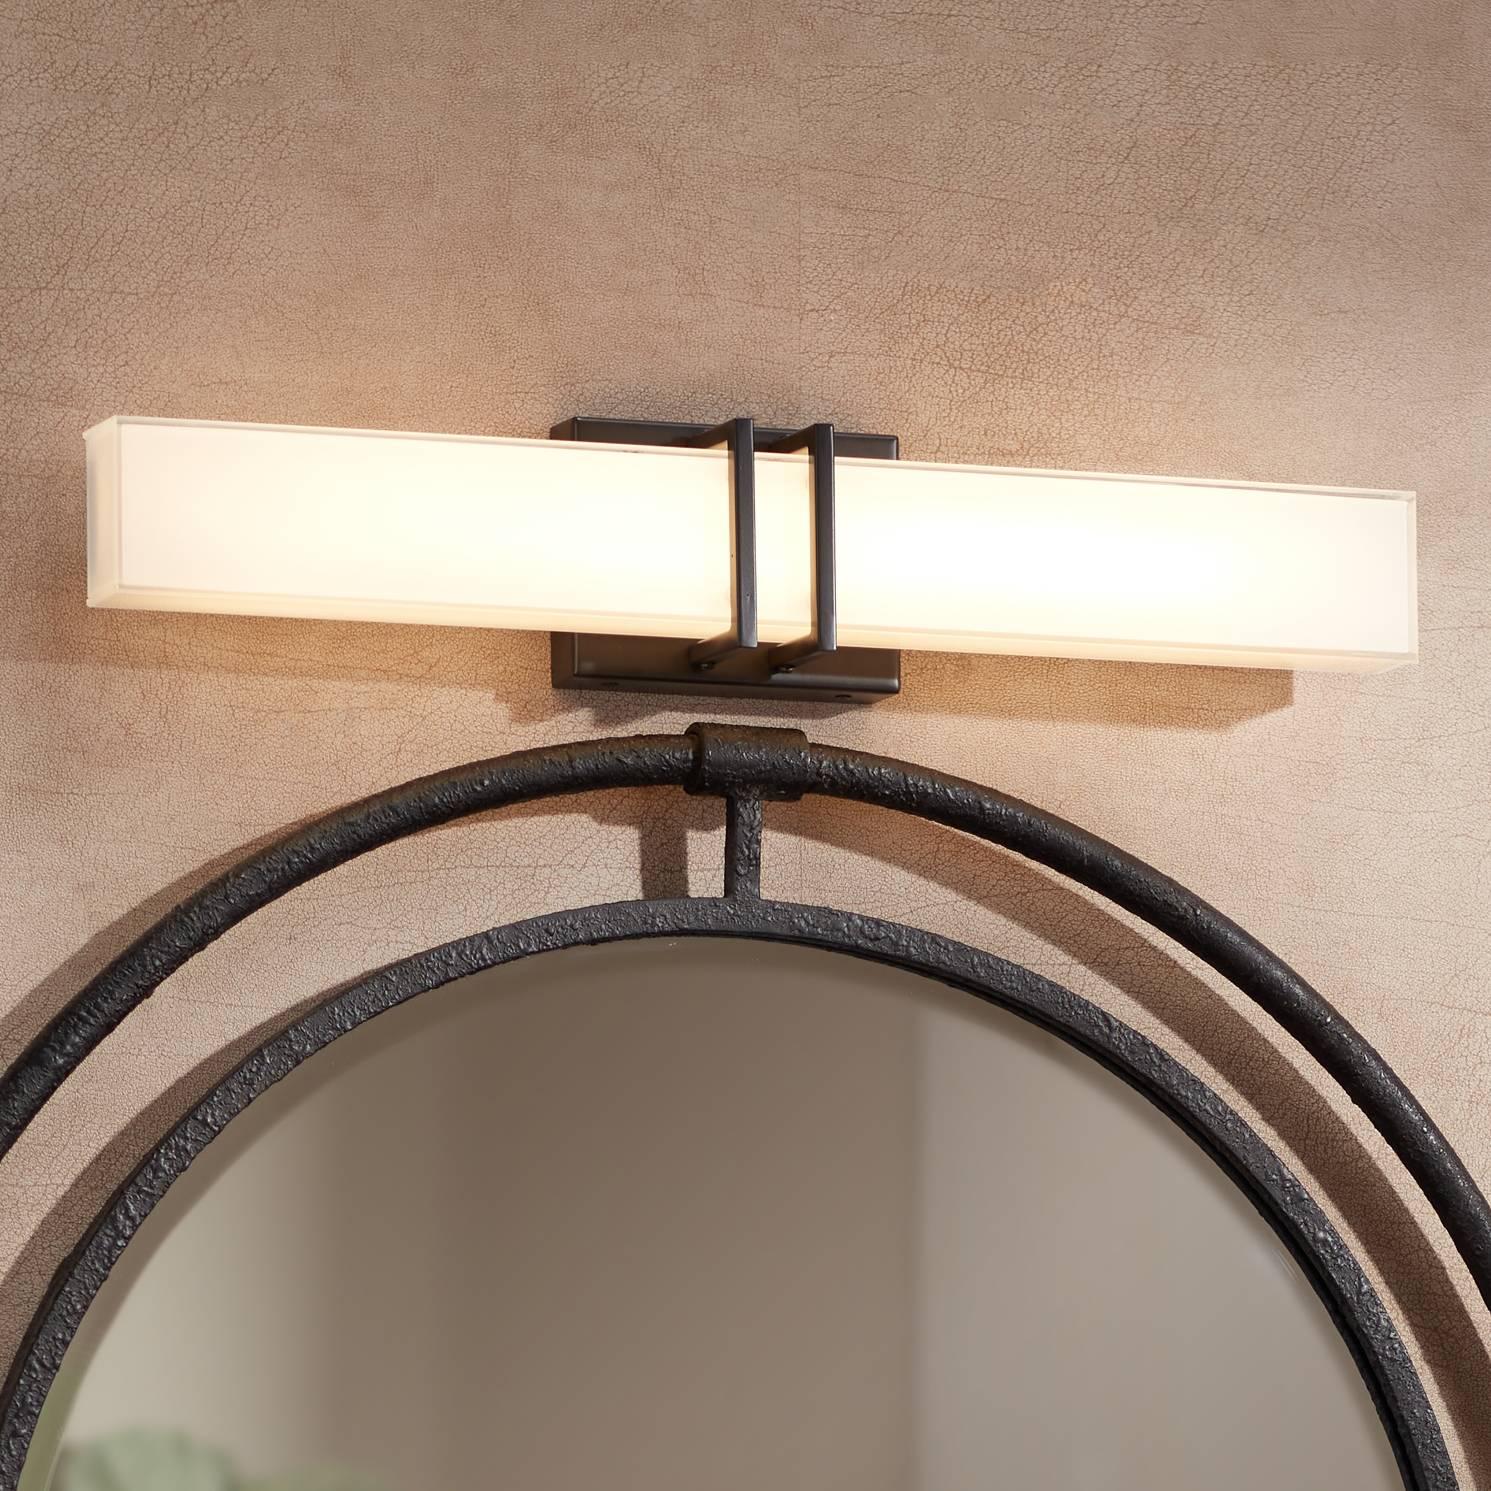 Pleasant Details About Possini Euro Exeter 24W Bronze Led Bathroom Vanity Light Download Free Architecture Designs Scobabritishbridgeorg